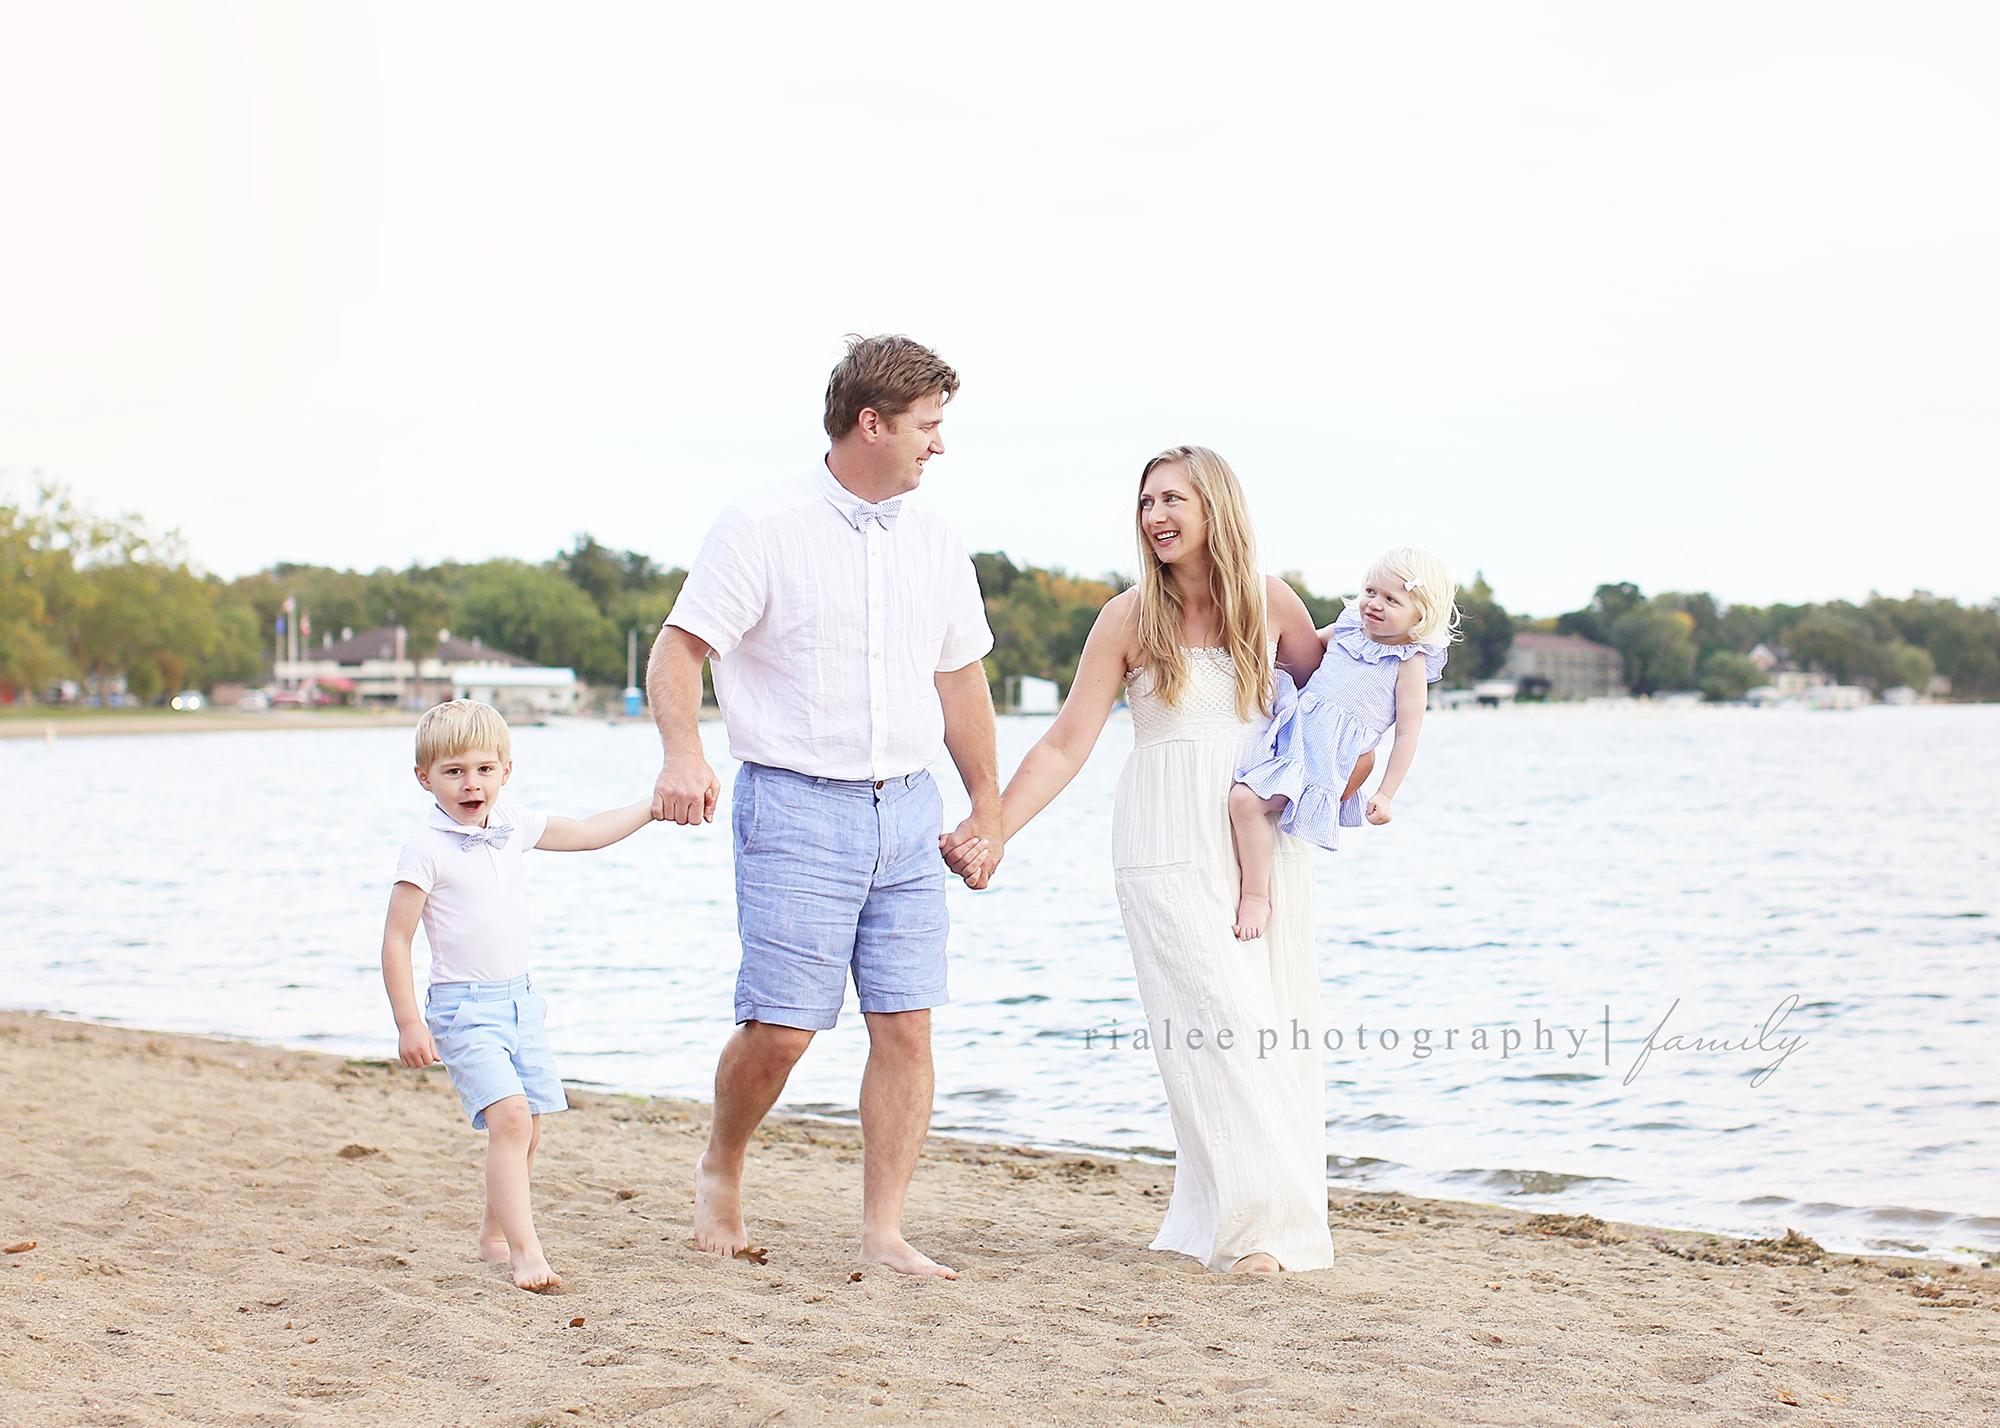 ndfamilyphotographer.jpg